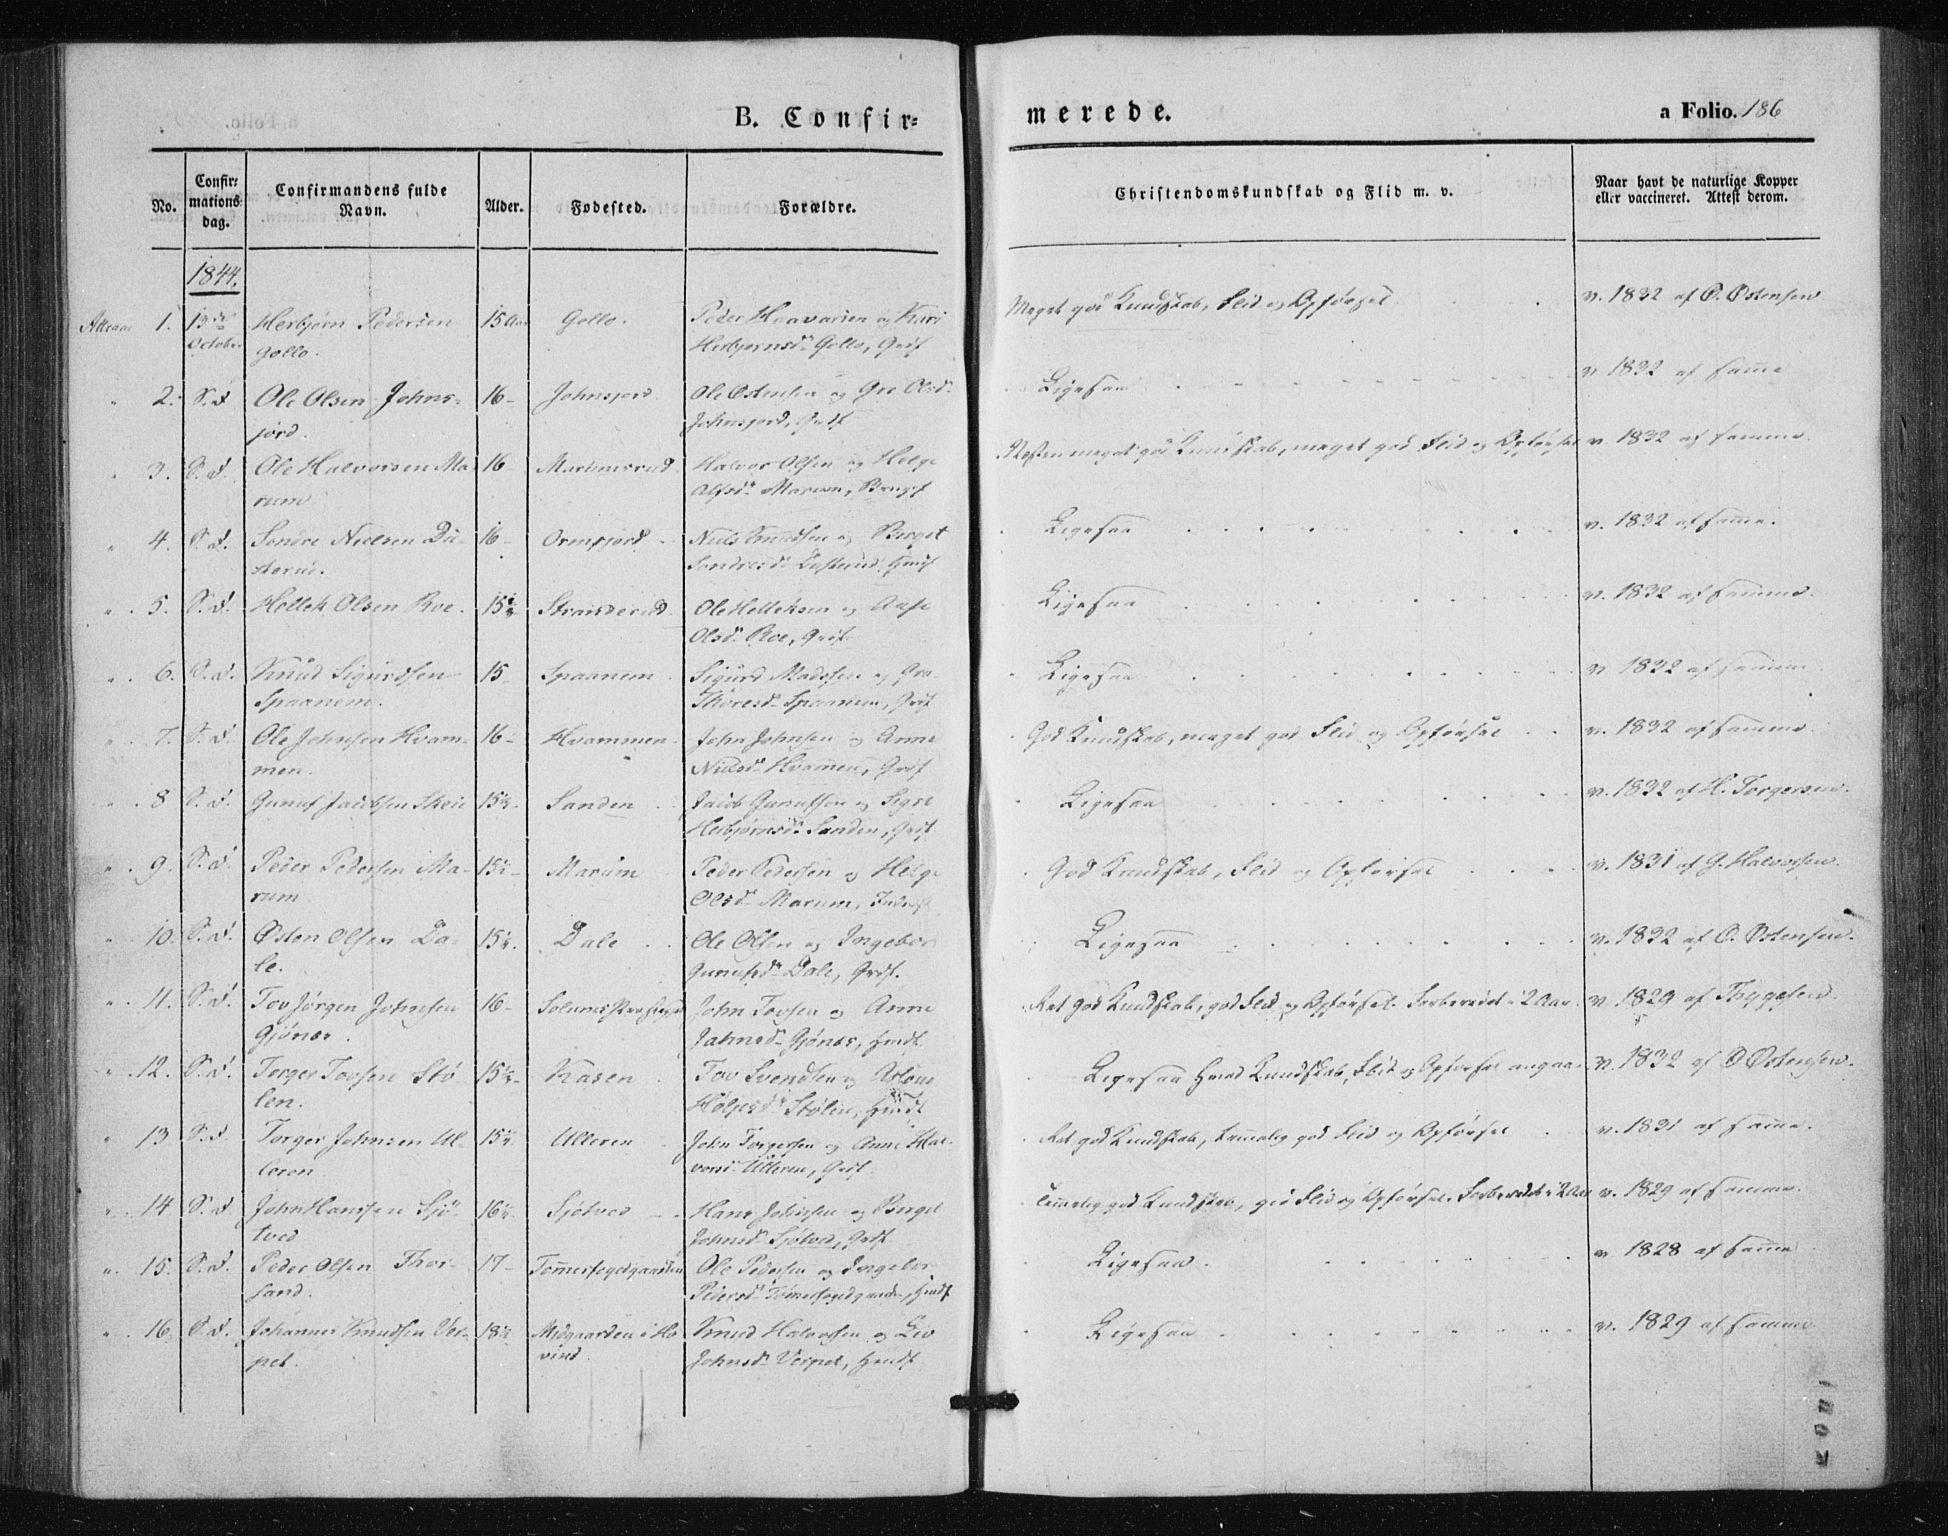 SAKO, Tinn kirkebøker, F/Fa/L0005: Ministerialbok nr. I 5, 1844-1856, s. 186